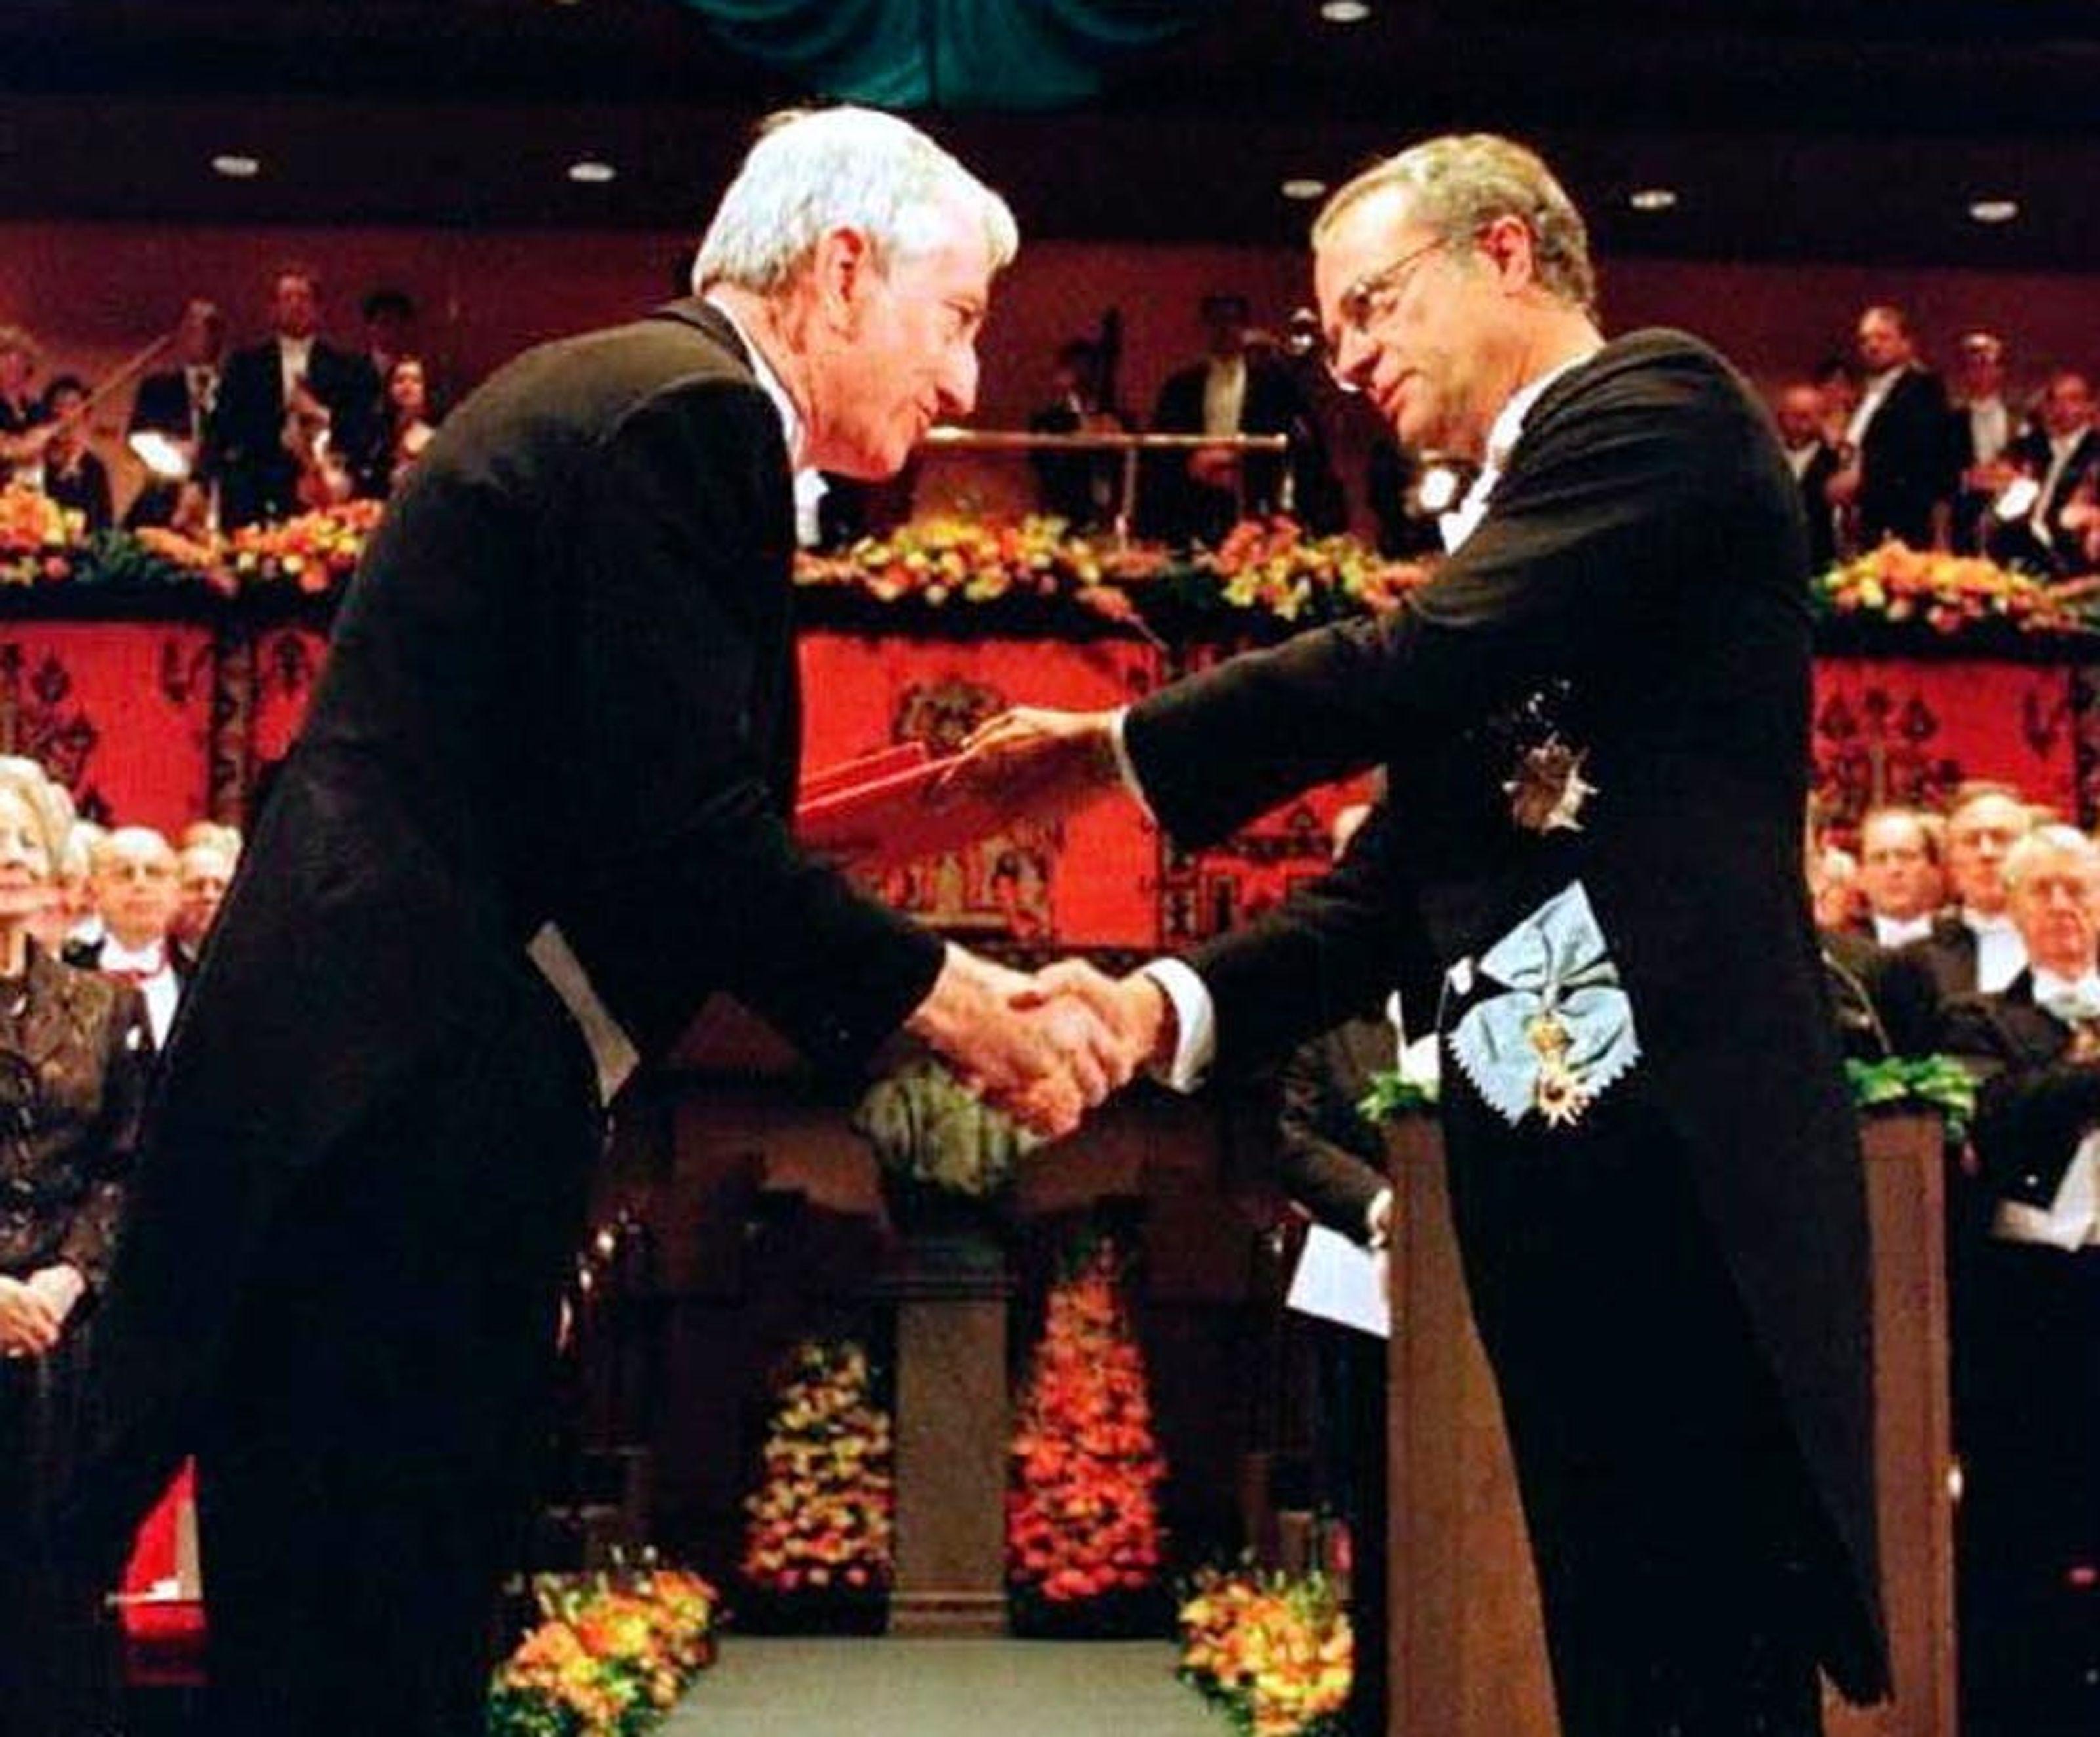 Peter Doherty picks up his Nobel Prize for Medicine fromSweden's King Carl Gustav